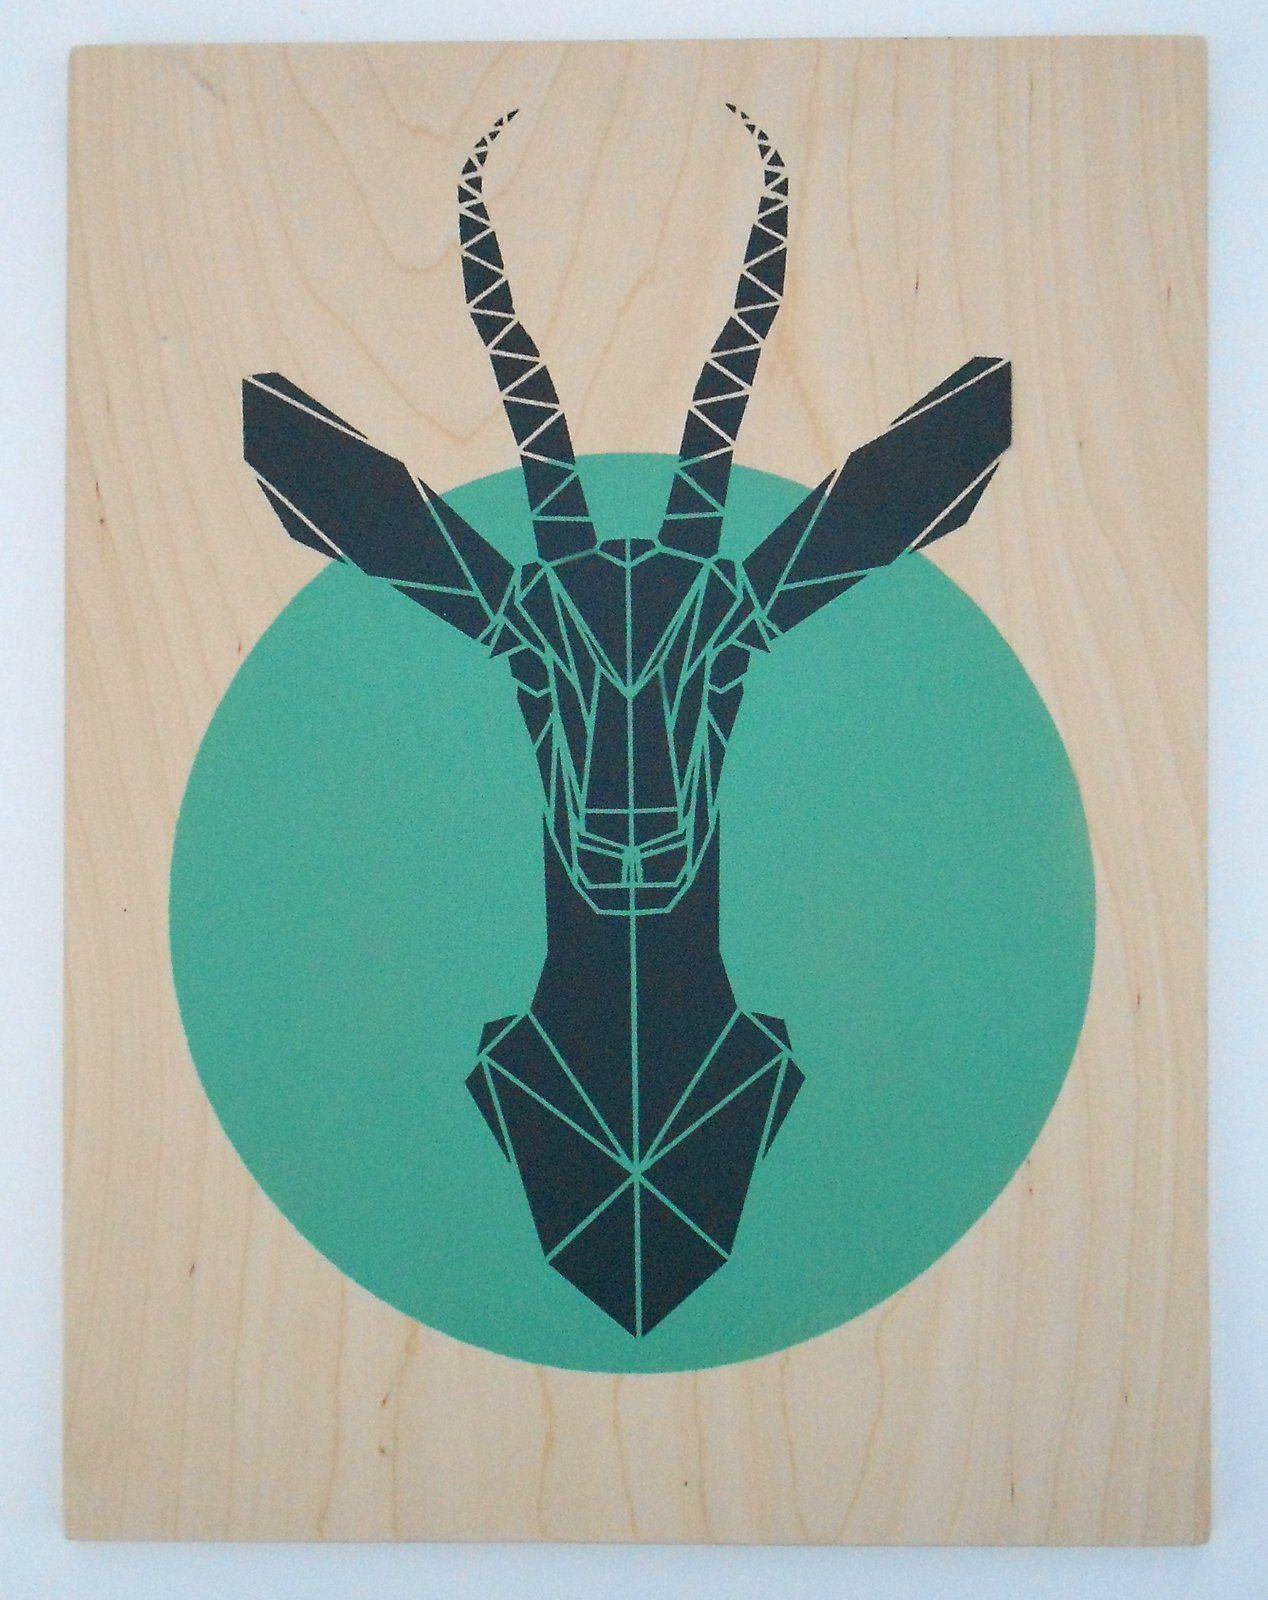 Gazelle Stencil Art Aqua Print Geometric Spray Paint On